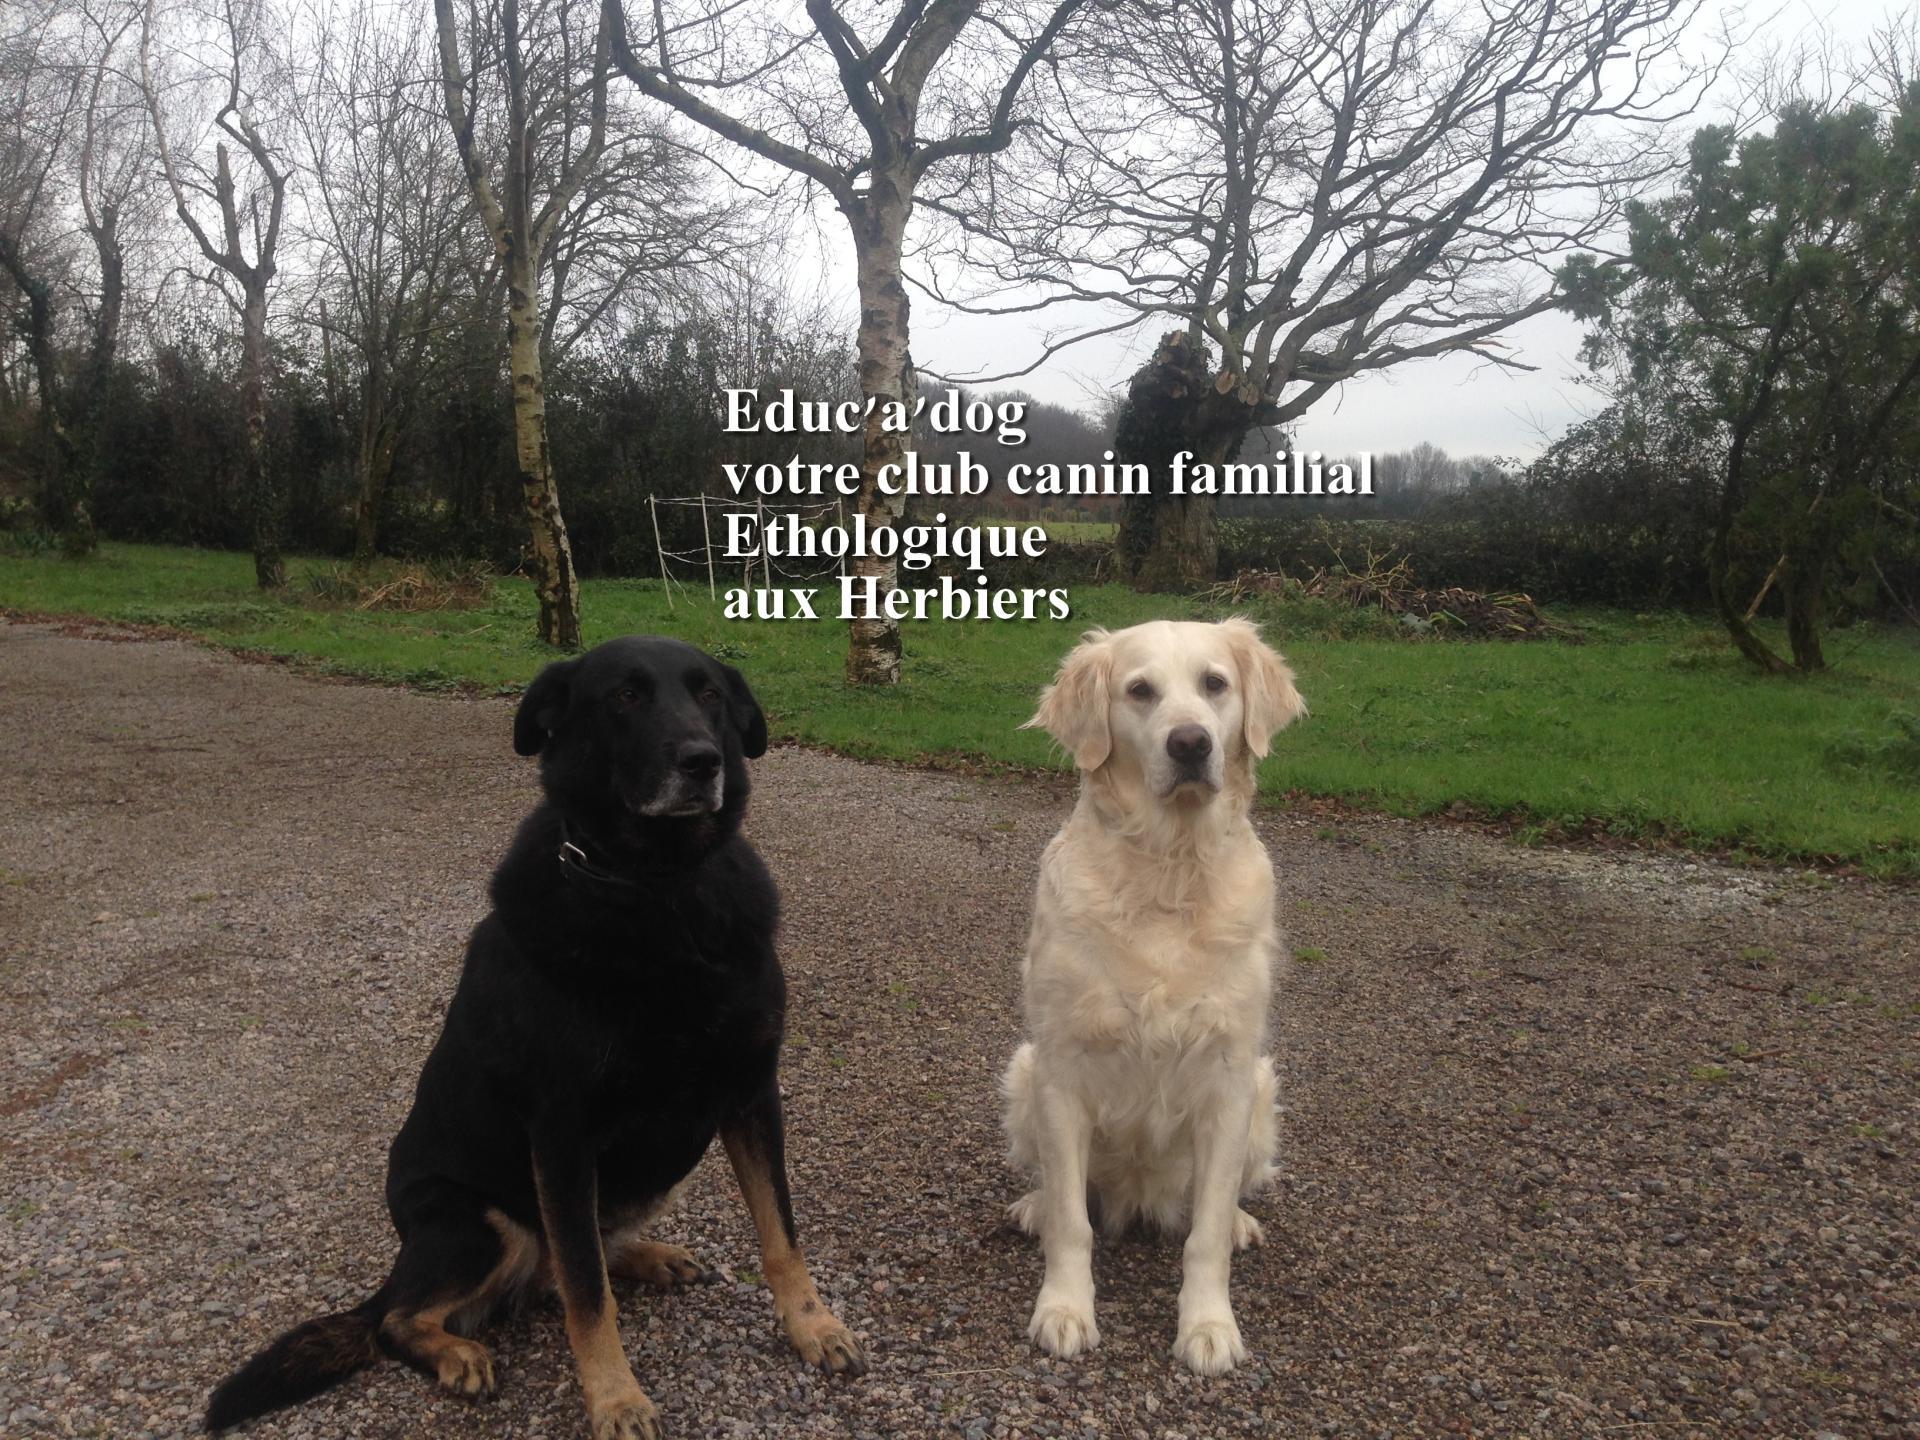 club canin tarif